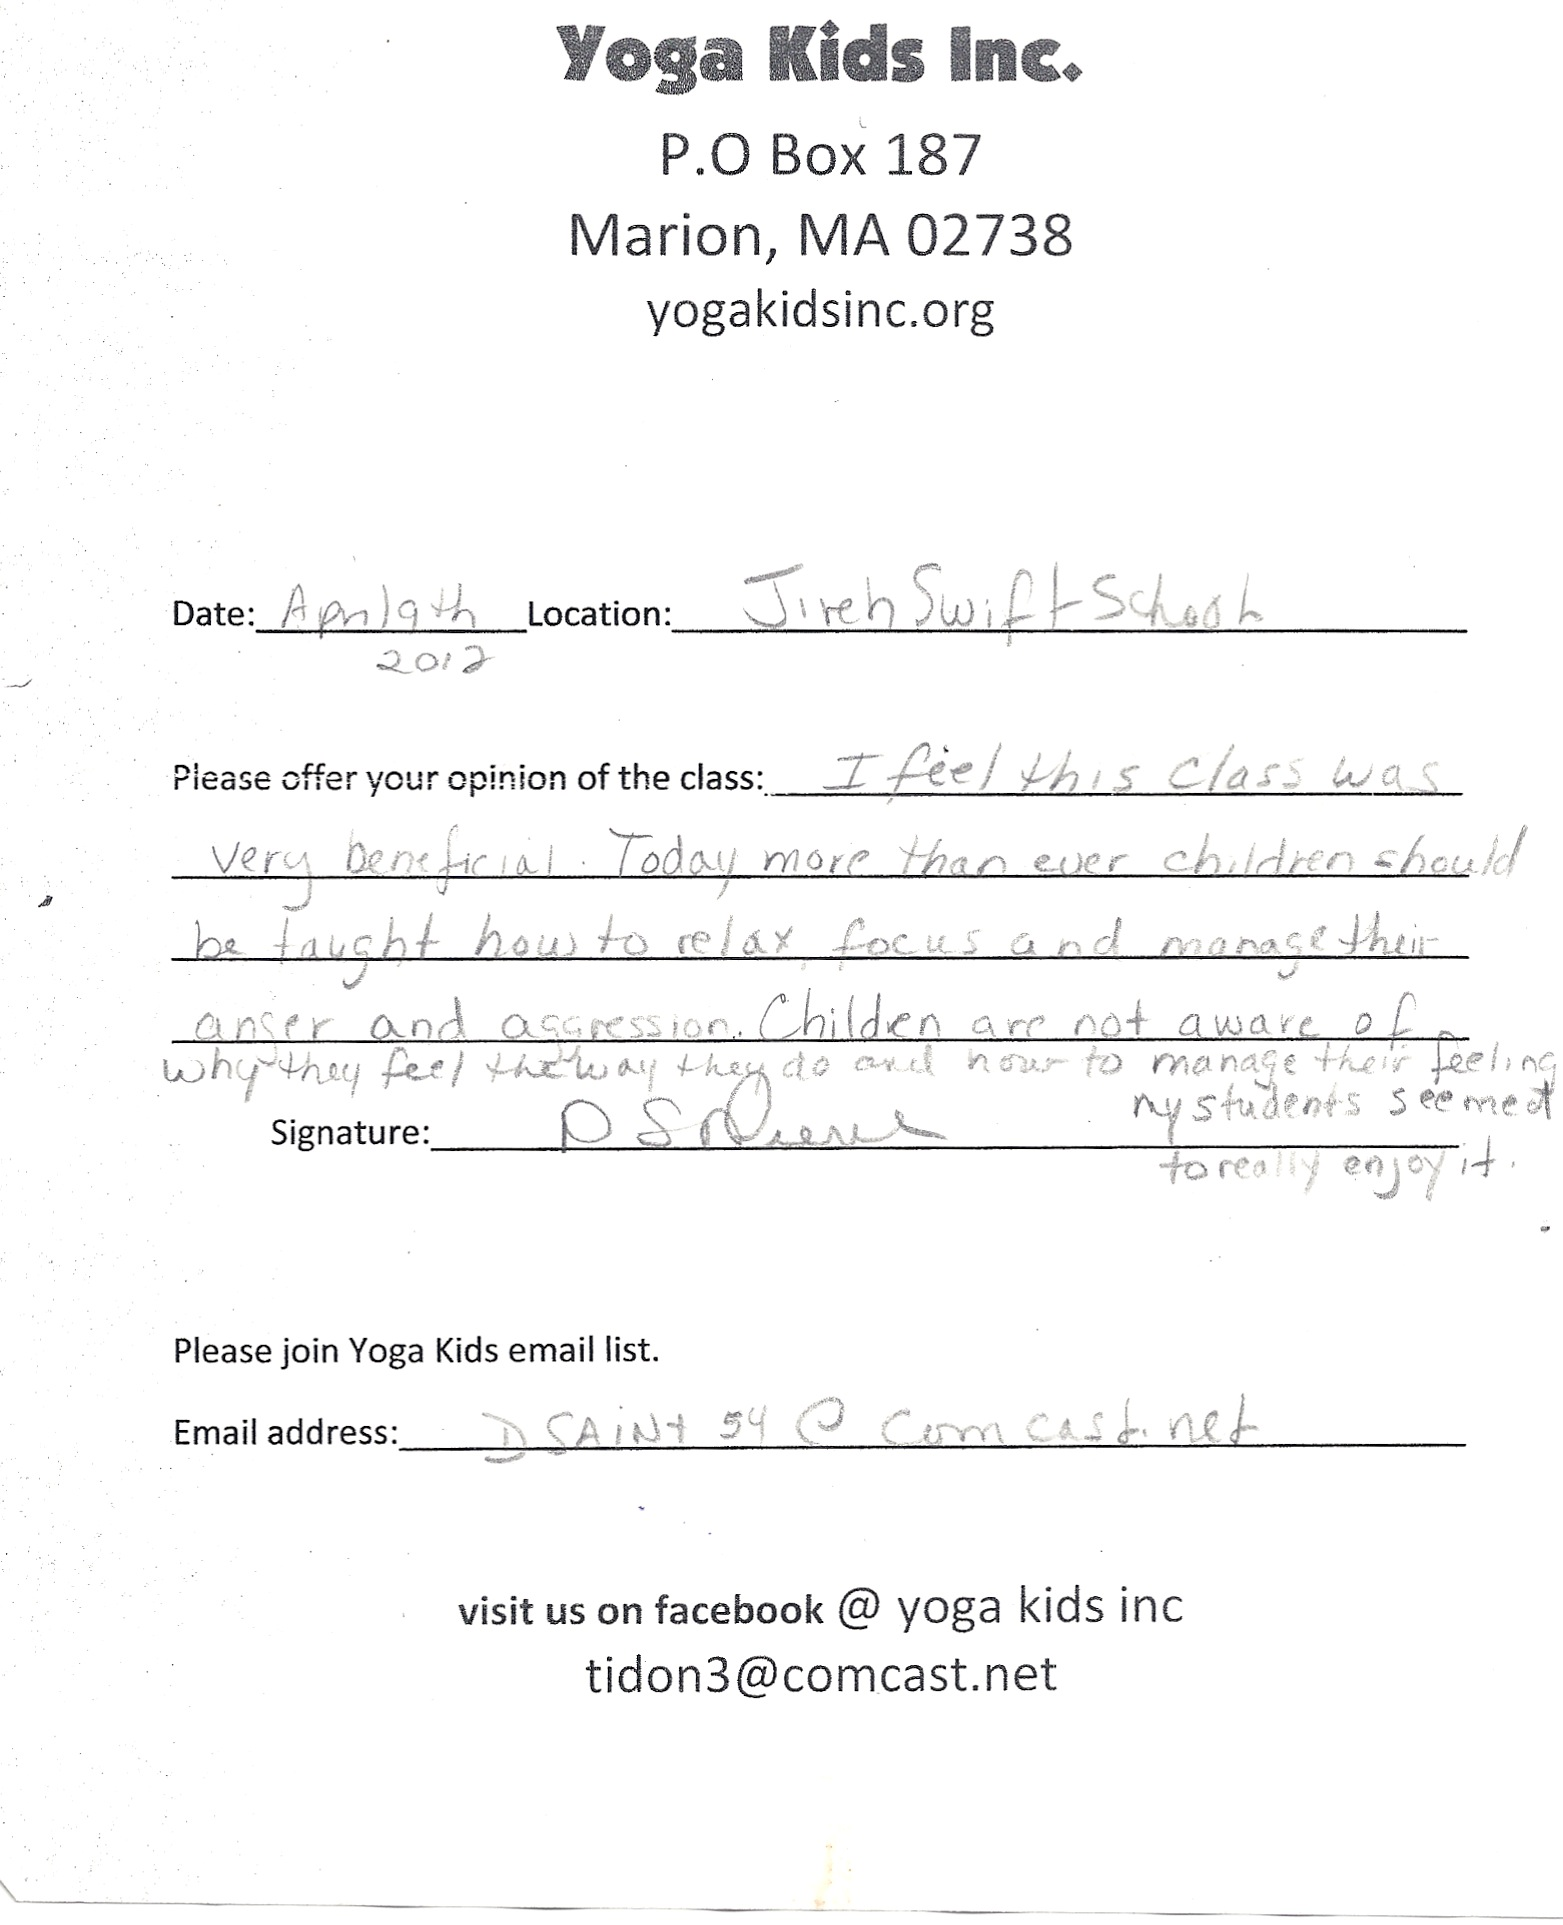 Sick leave letter format for school image collections letter school leave letter for fever format cover letter thecheapjerseys Image collections